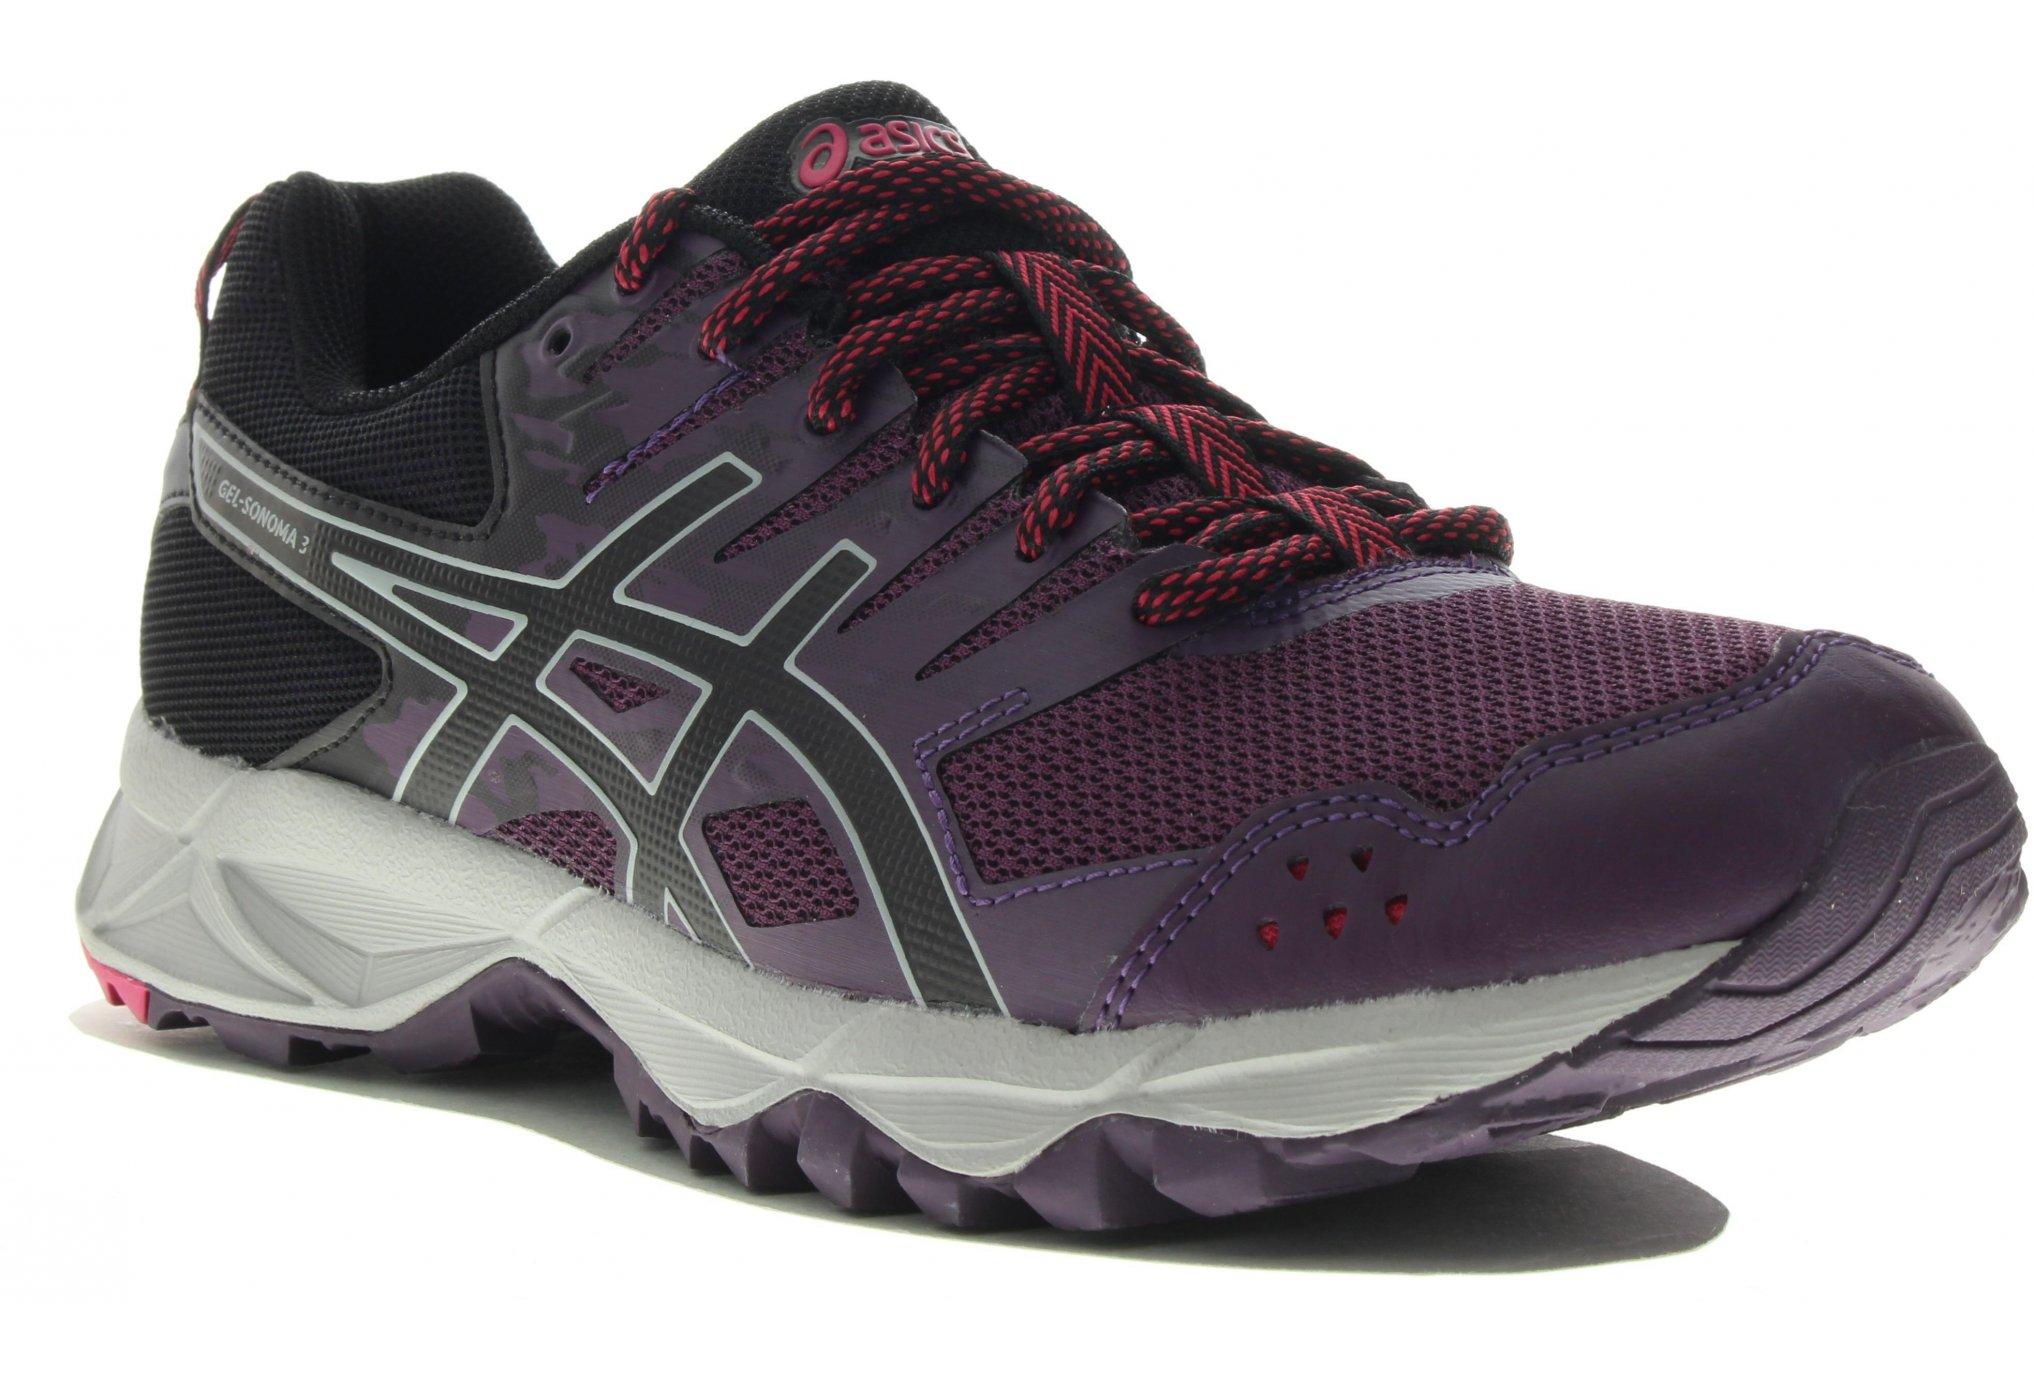 Asics Gel Sonoma 3 W Chaussures running femme